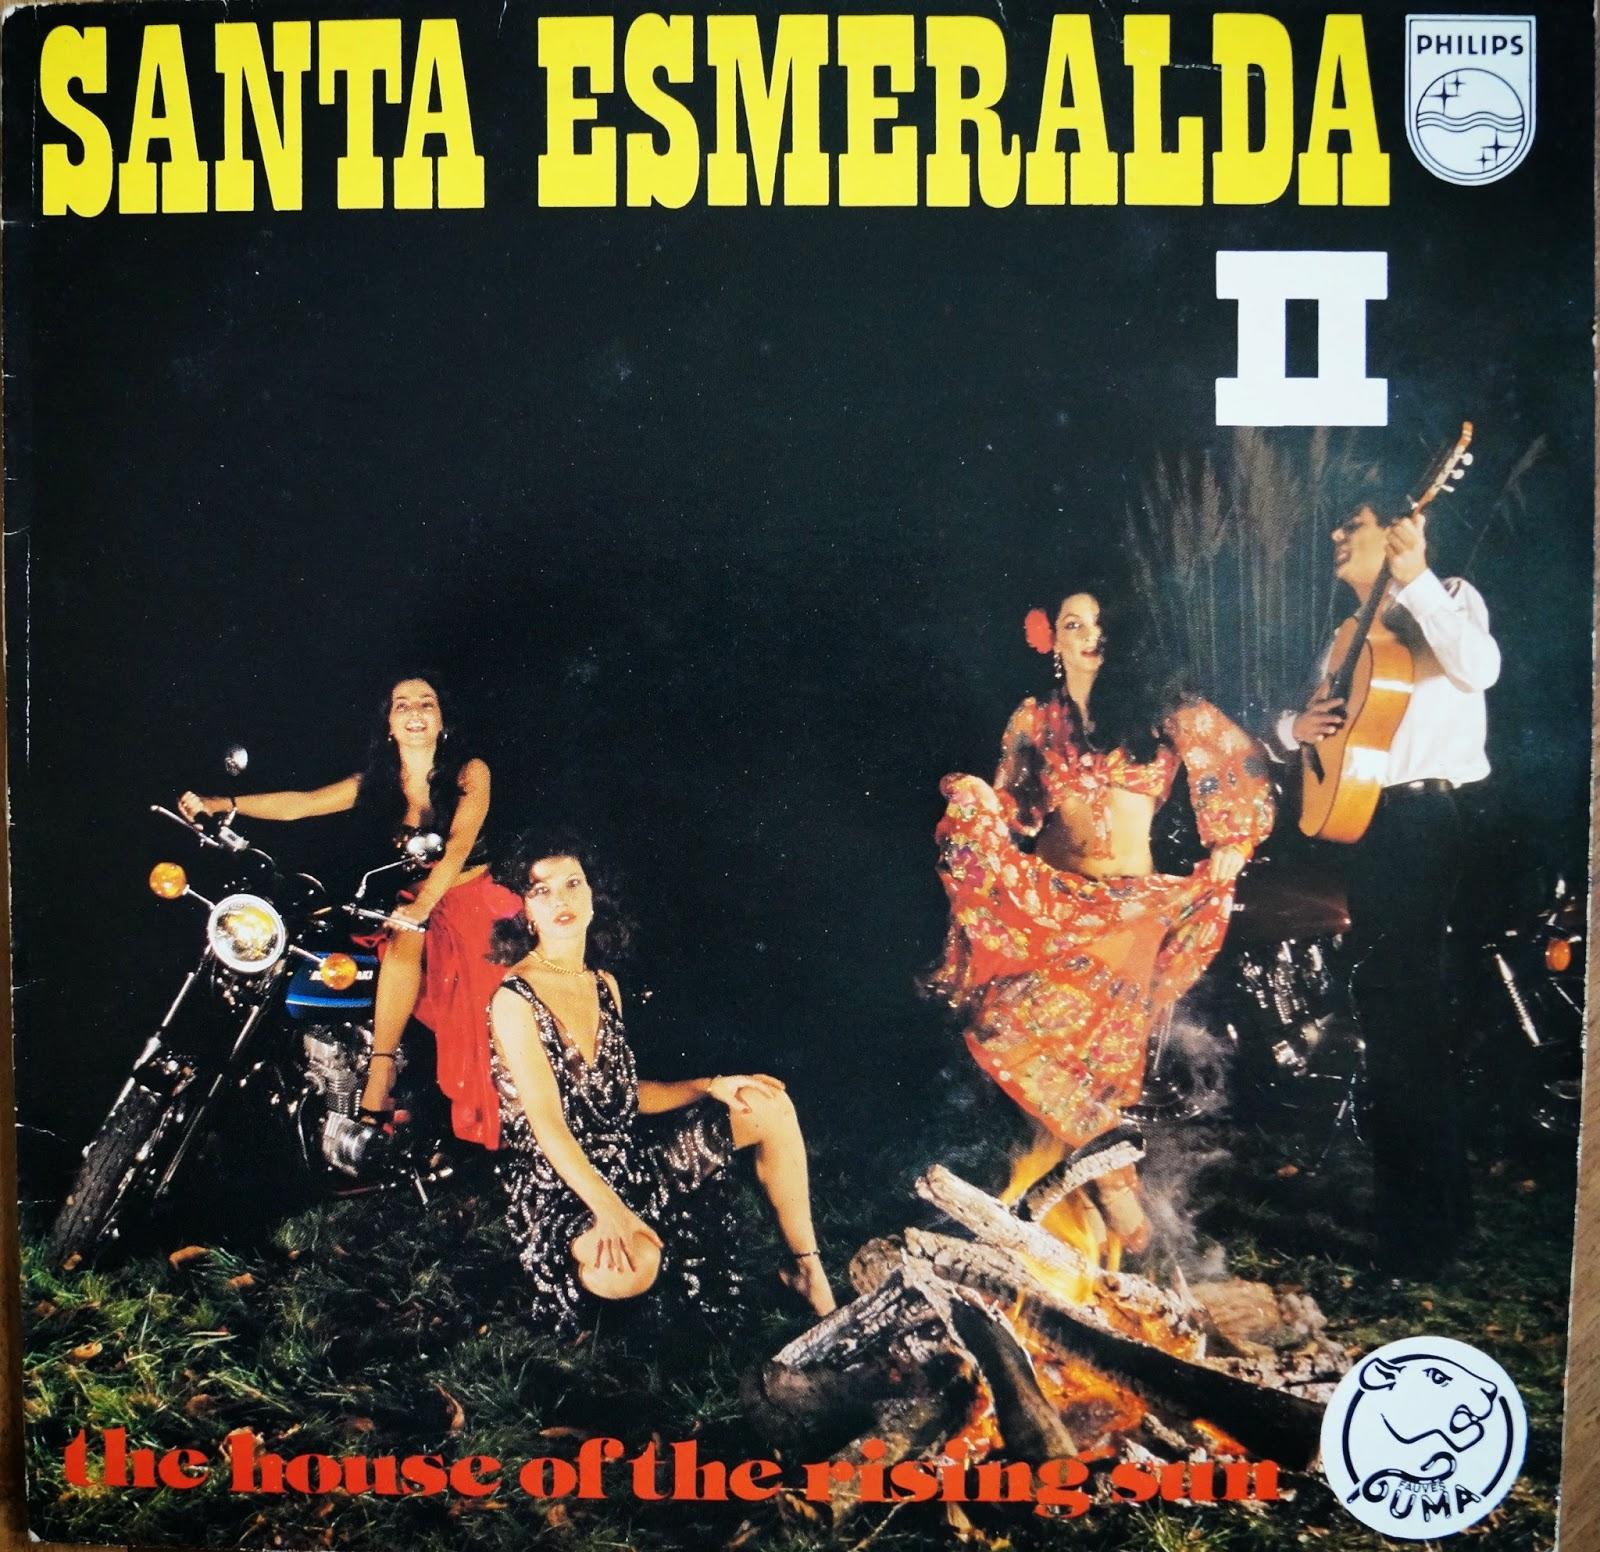 Santa Esmeralda Starring Leroy Gomez Dont Let Me Be Misunderstood